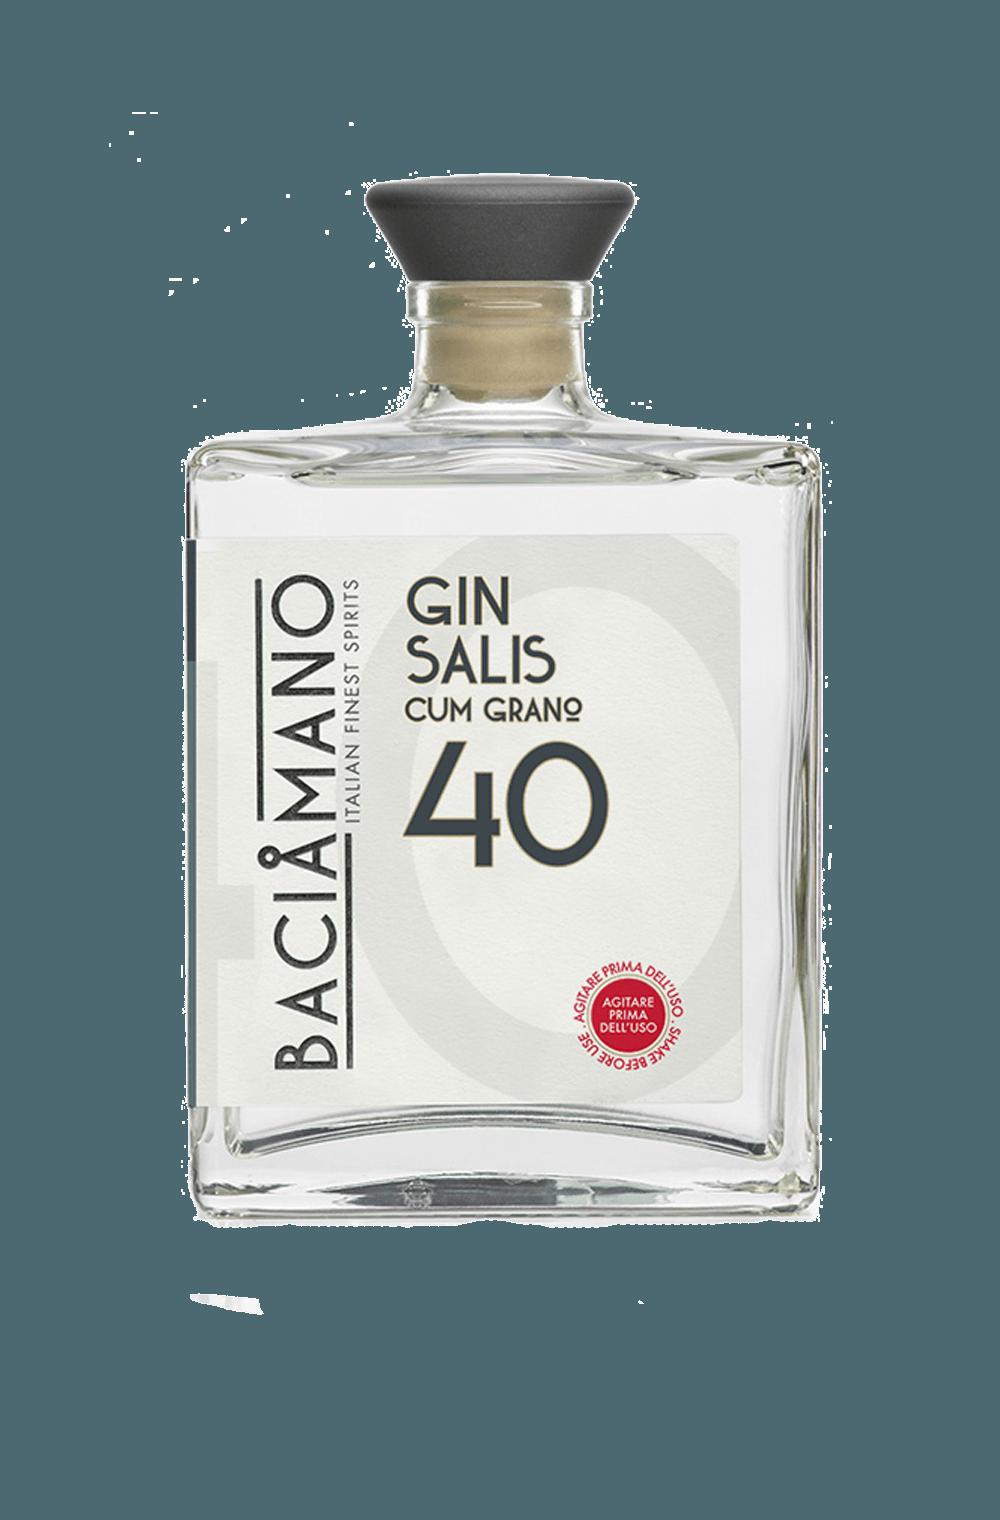 Baciamano (cum grano) Salis Gin 40